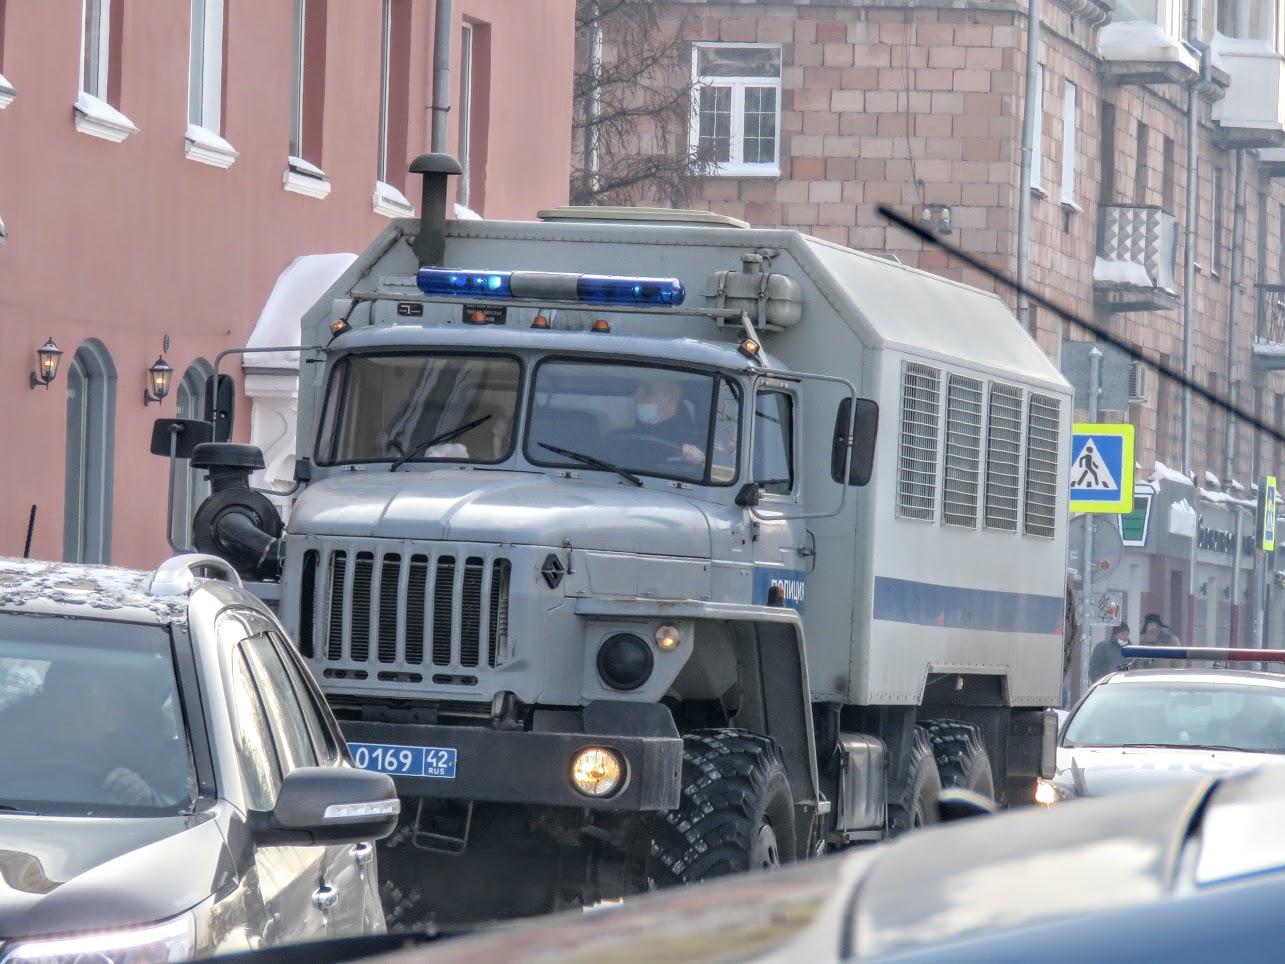 Транспорт не ходит - трамваи, троллейбусы. Полиция, люди, автозаки по городу IMG 1788